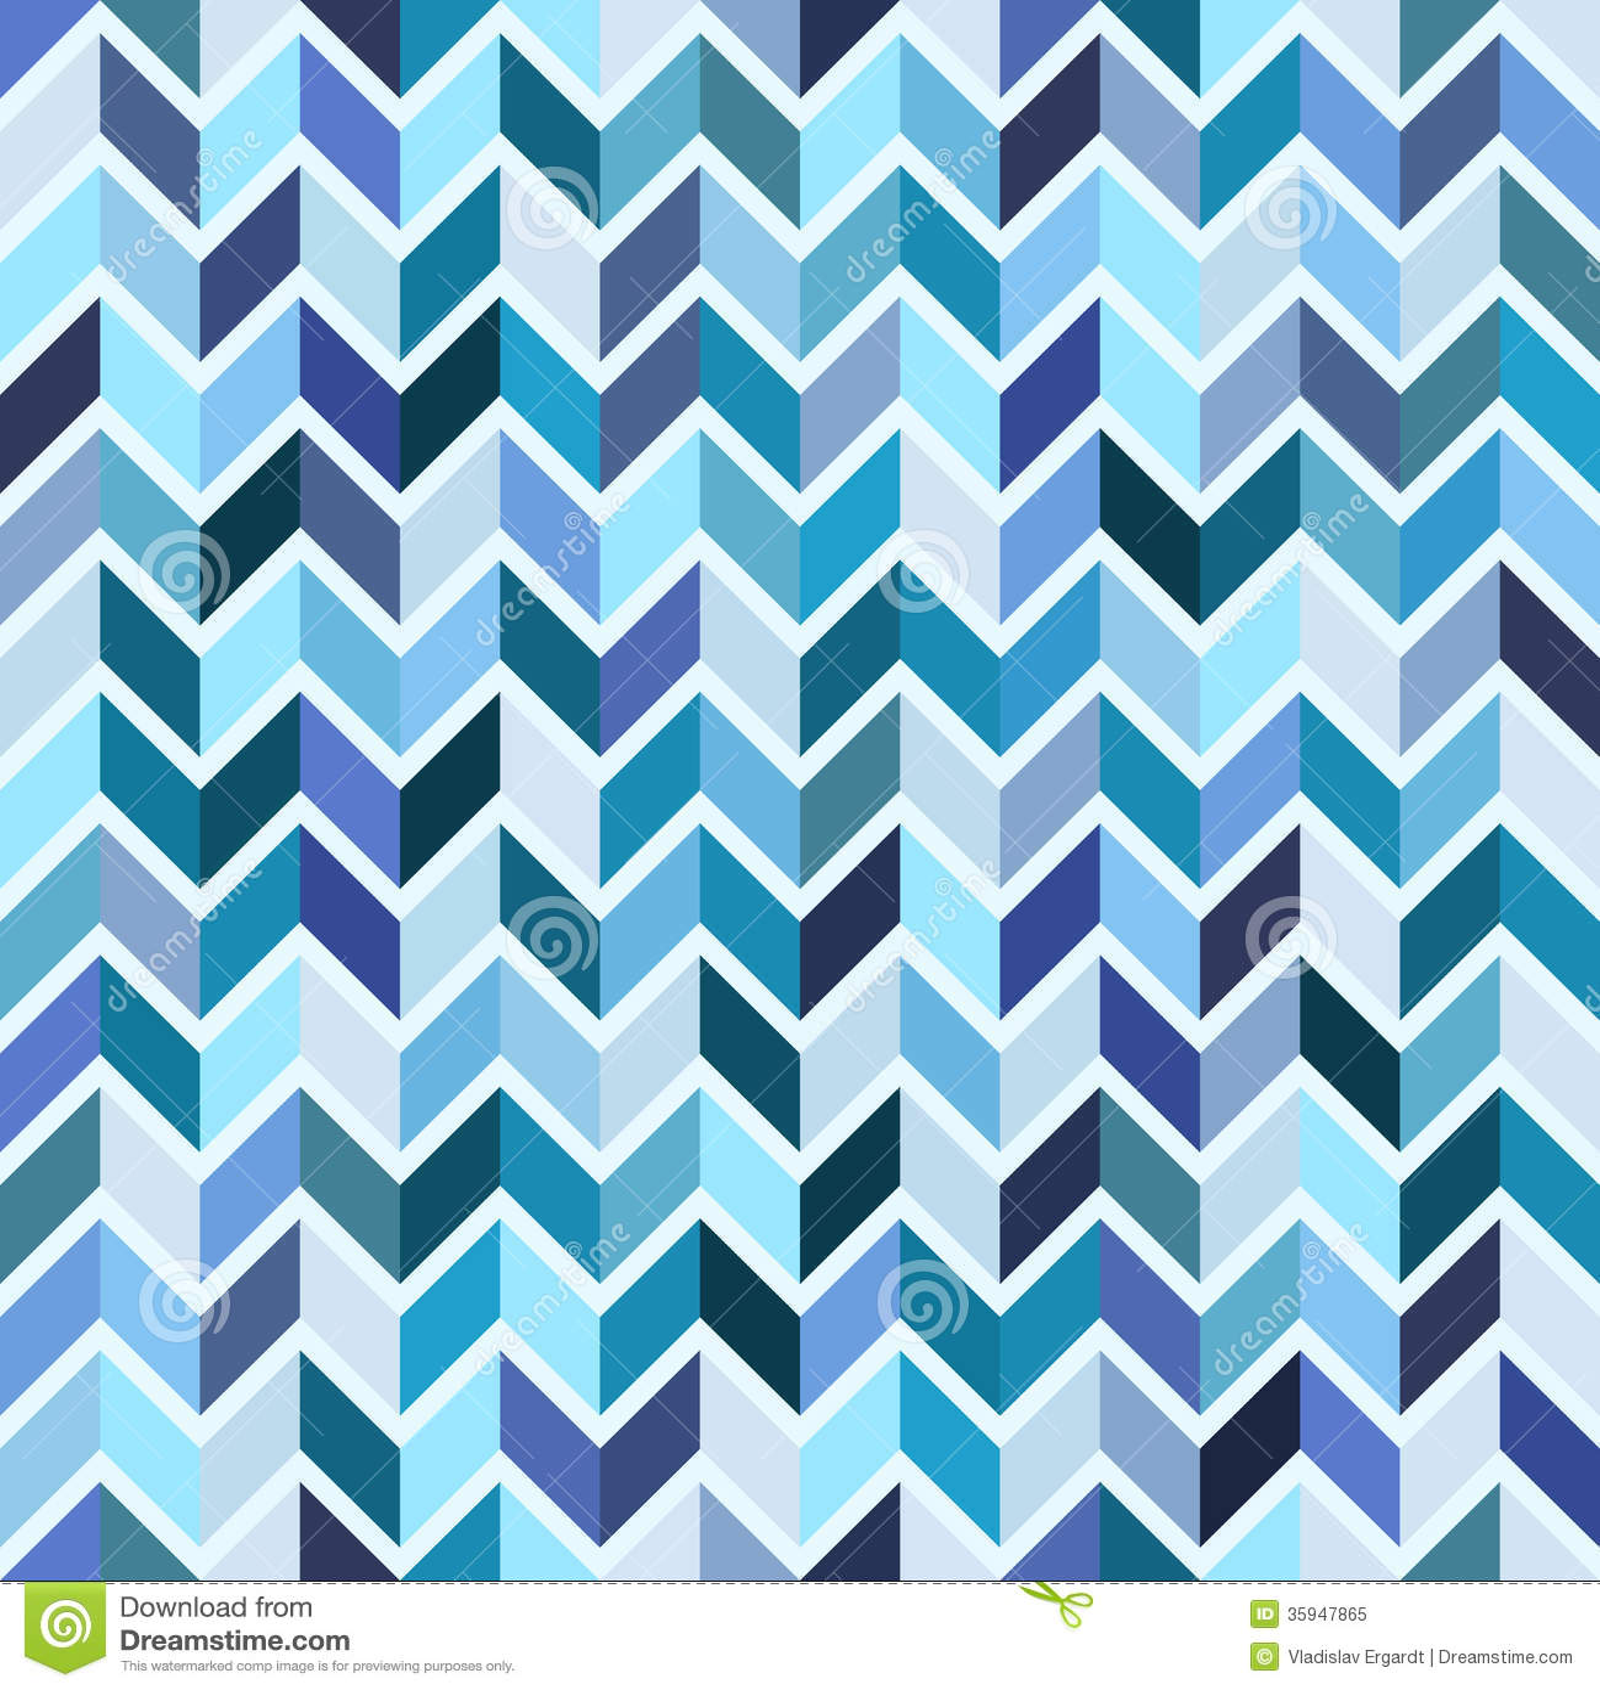 Teal chevron print background teal chevron background patterns - Seamless Geometric Pattern Blue Mosaic Royalty Free Stock